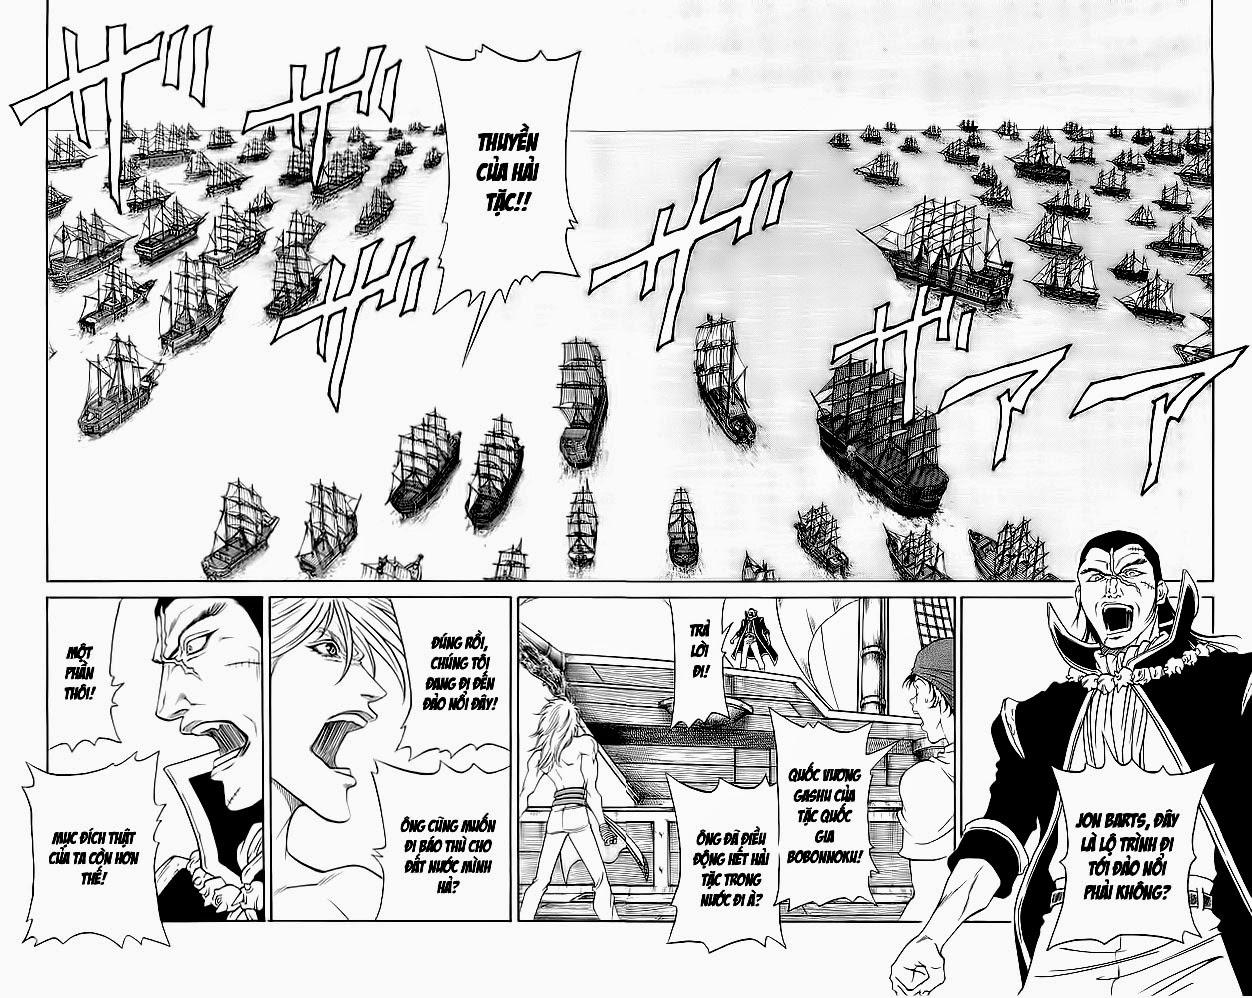 Vua Trên Biển – Coco Full Ahead chap 220 Trang 8 - Mangak.info